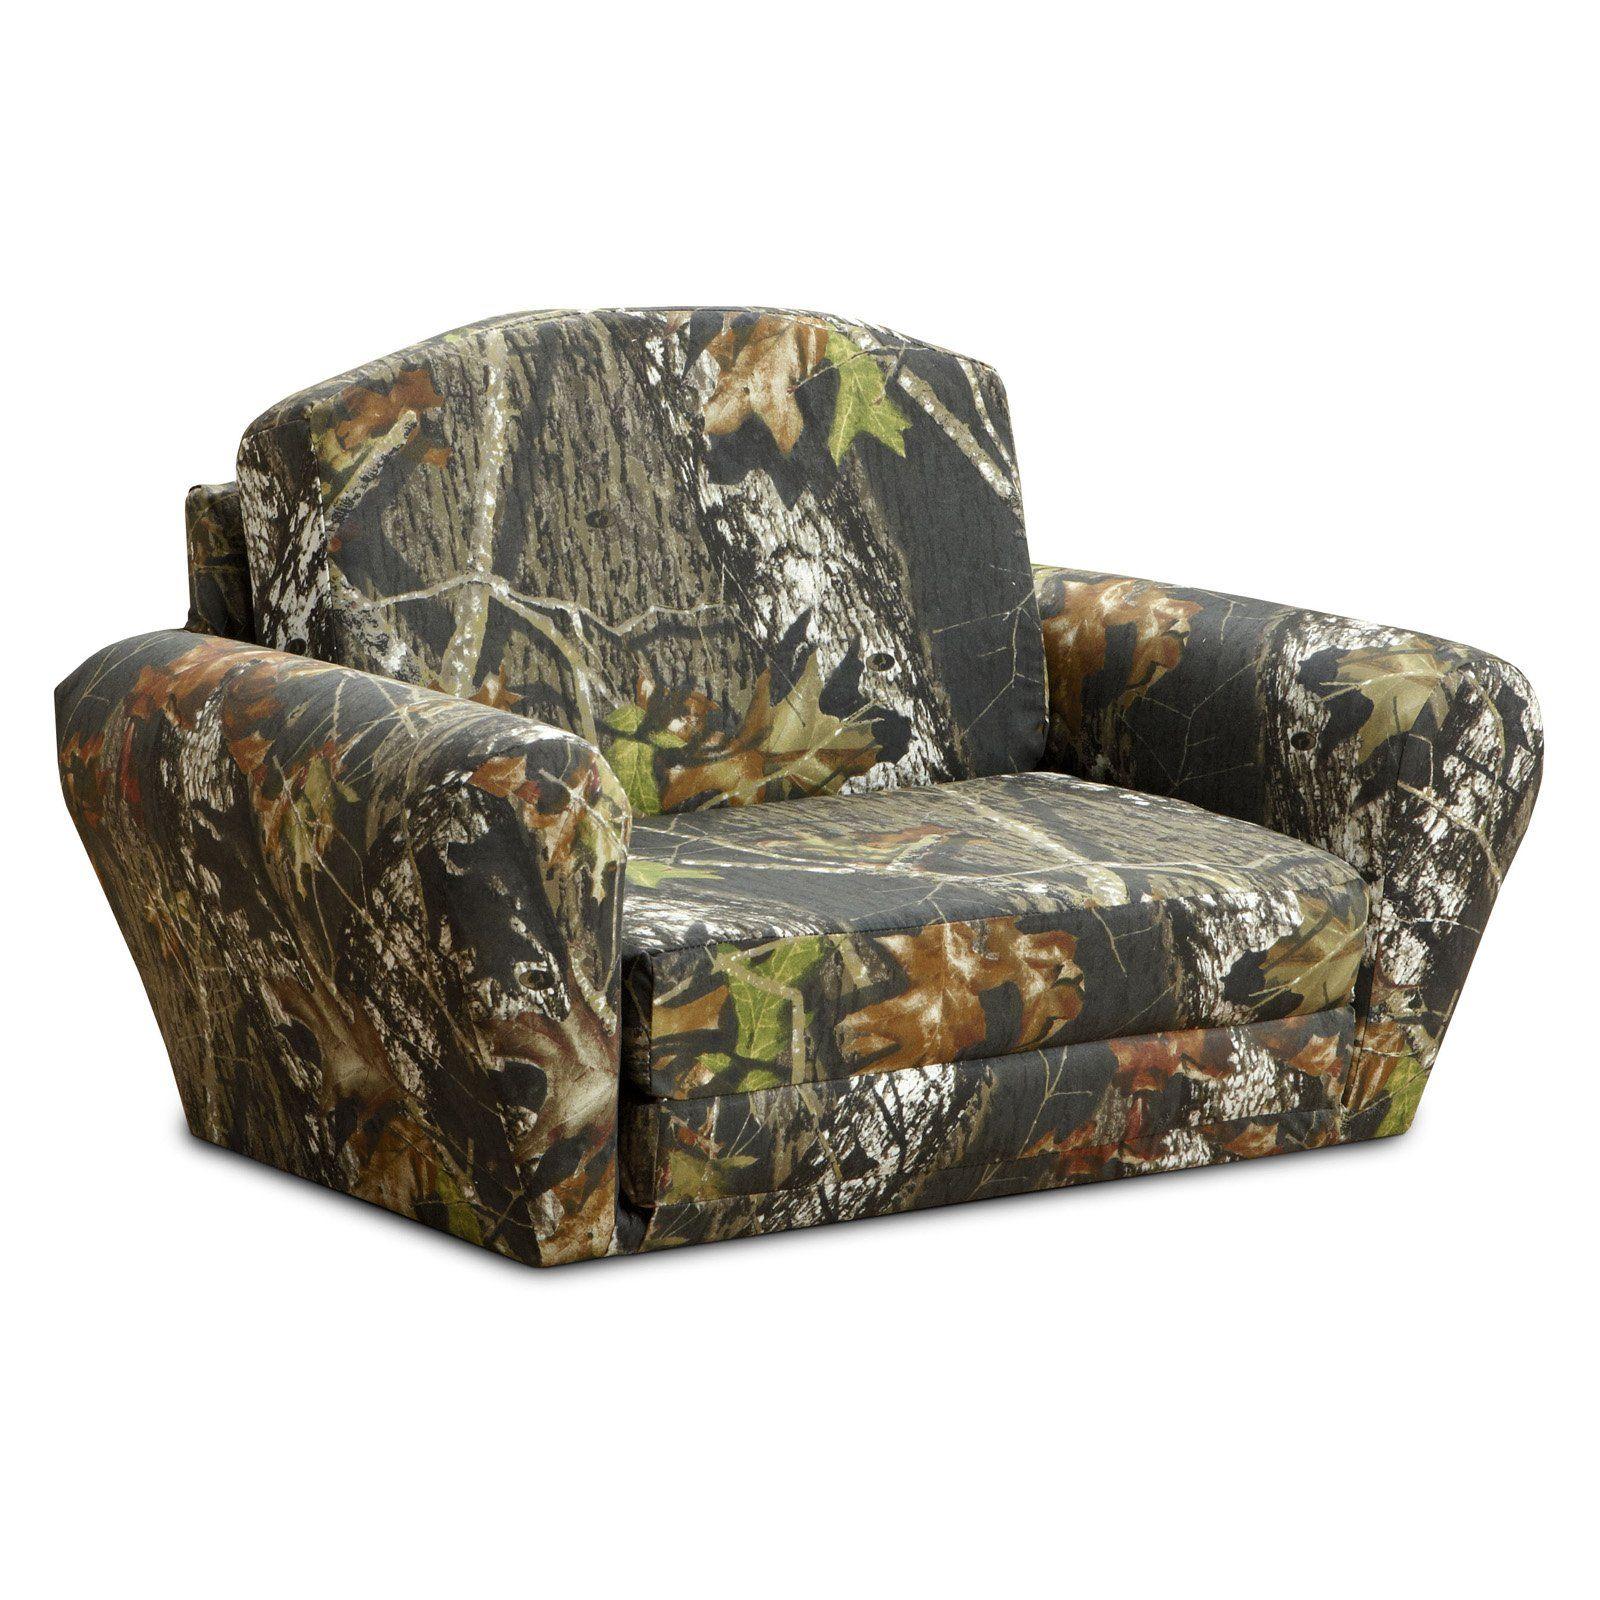 Camo Bedroom Ideas Kidz World Mossy Oak Camouflage Sleepover